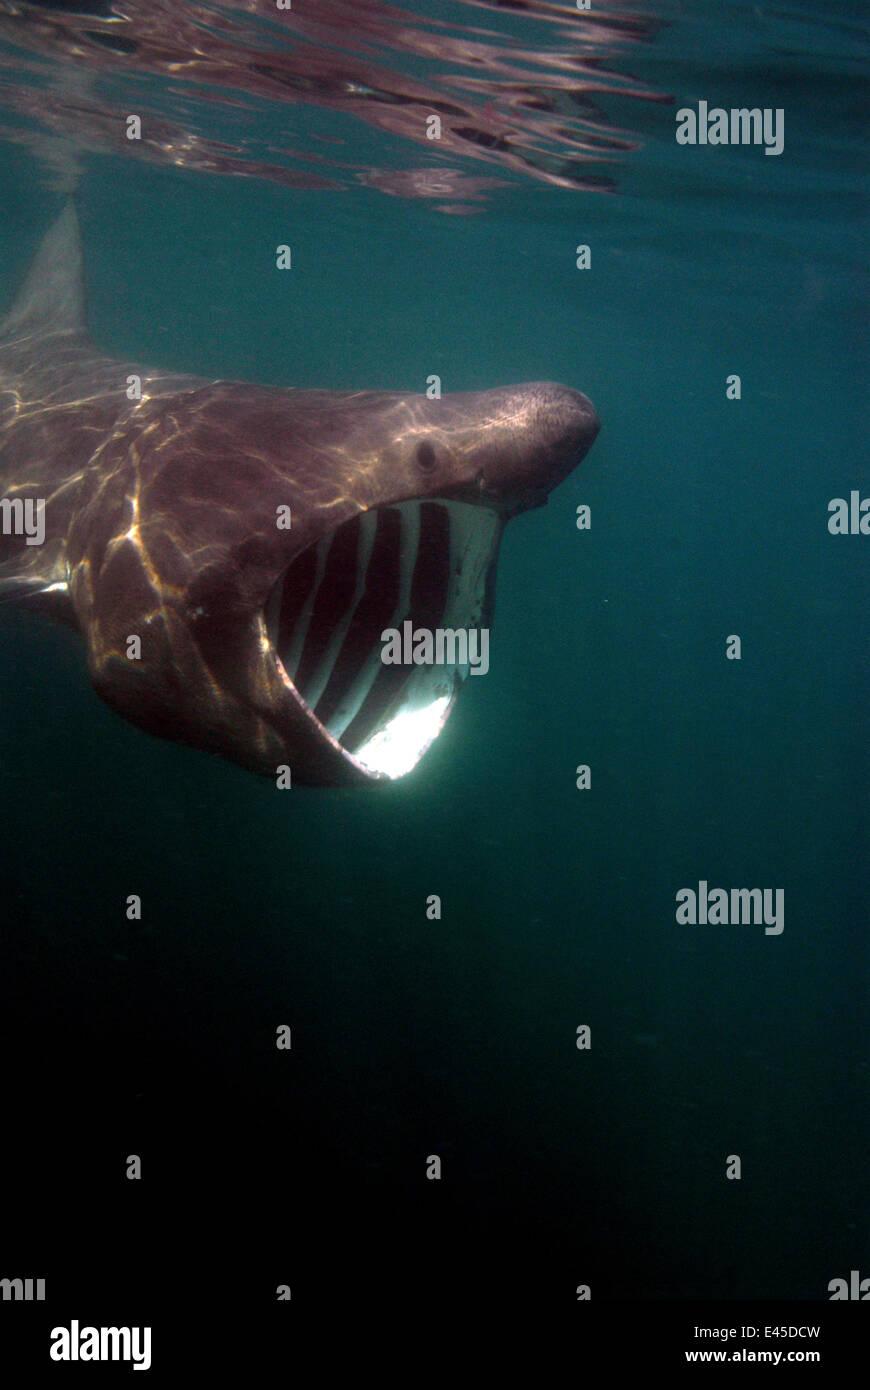 Basking shark {Cetorhinus maximus} feeding with mouth wide open, off Cornwall, UK - Stock Image